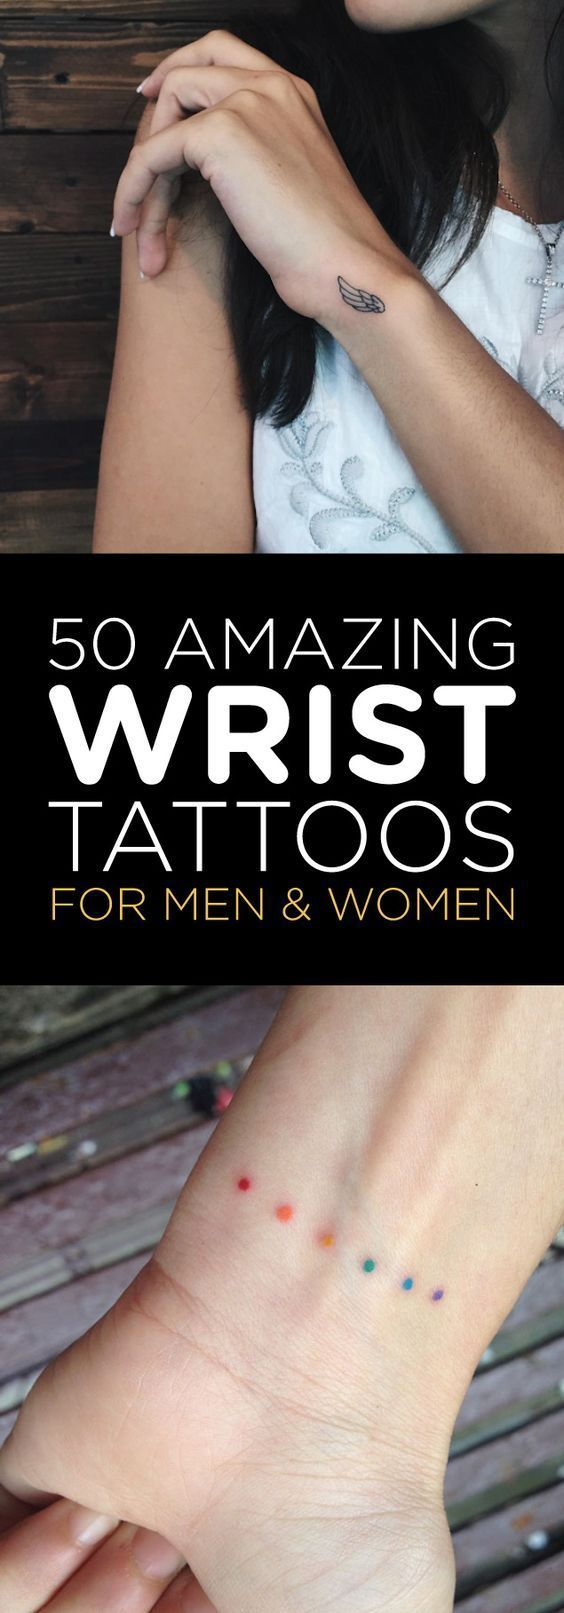 50 Amazing Wrist Tattoo Designs